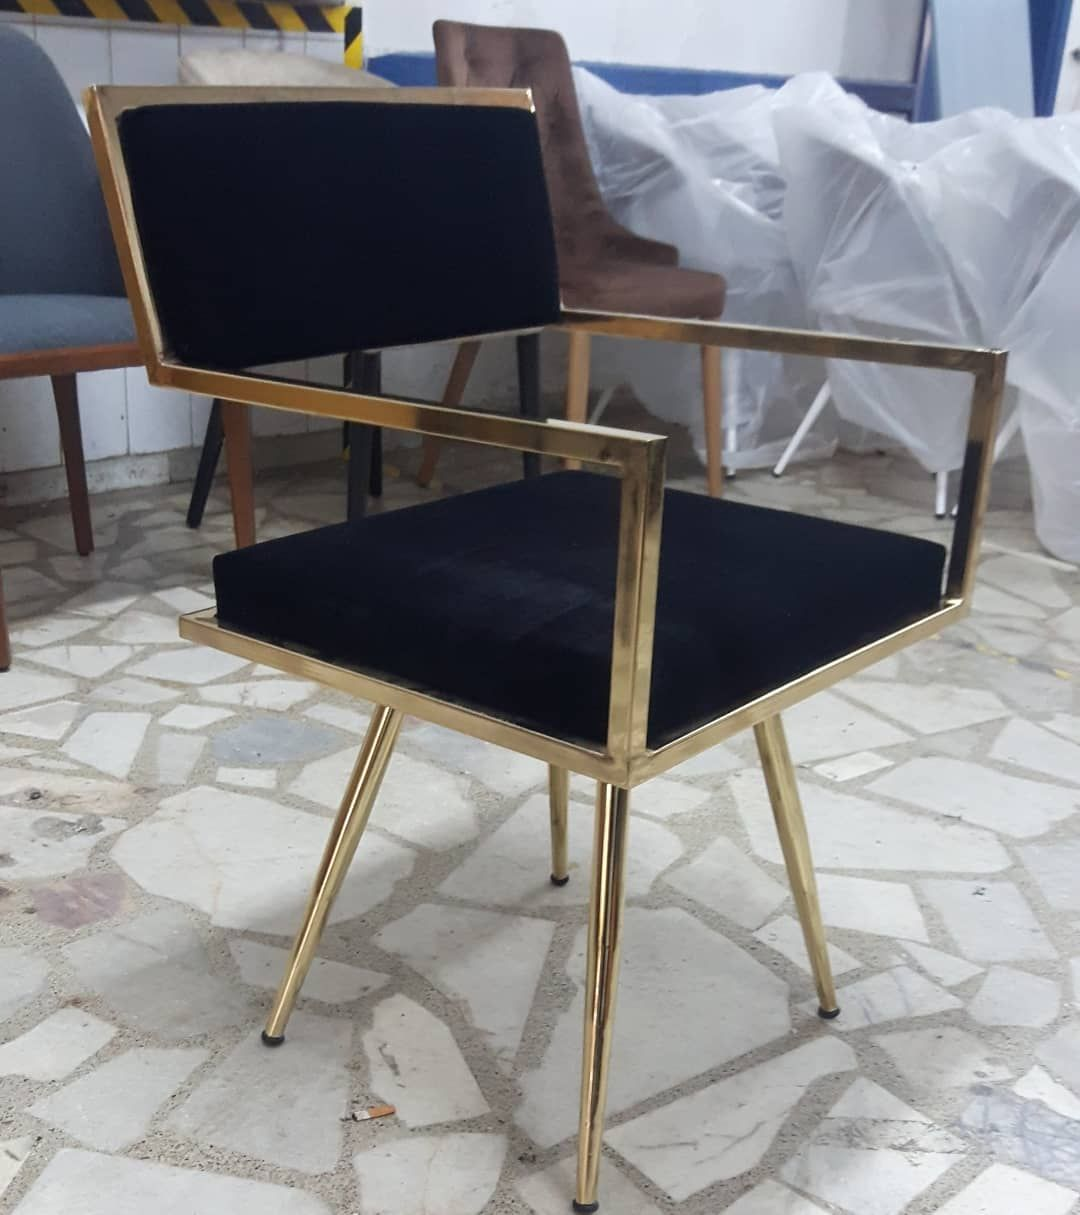 Marmarasandalye Imalat Toptan Perakende Tasarim Koltuk Sandalye Mimar Icmimar Dekorasyon Marmarasandalye Imalat Toptan Dining Chairs Decor Chair